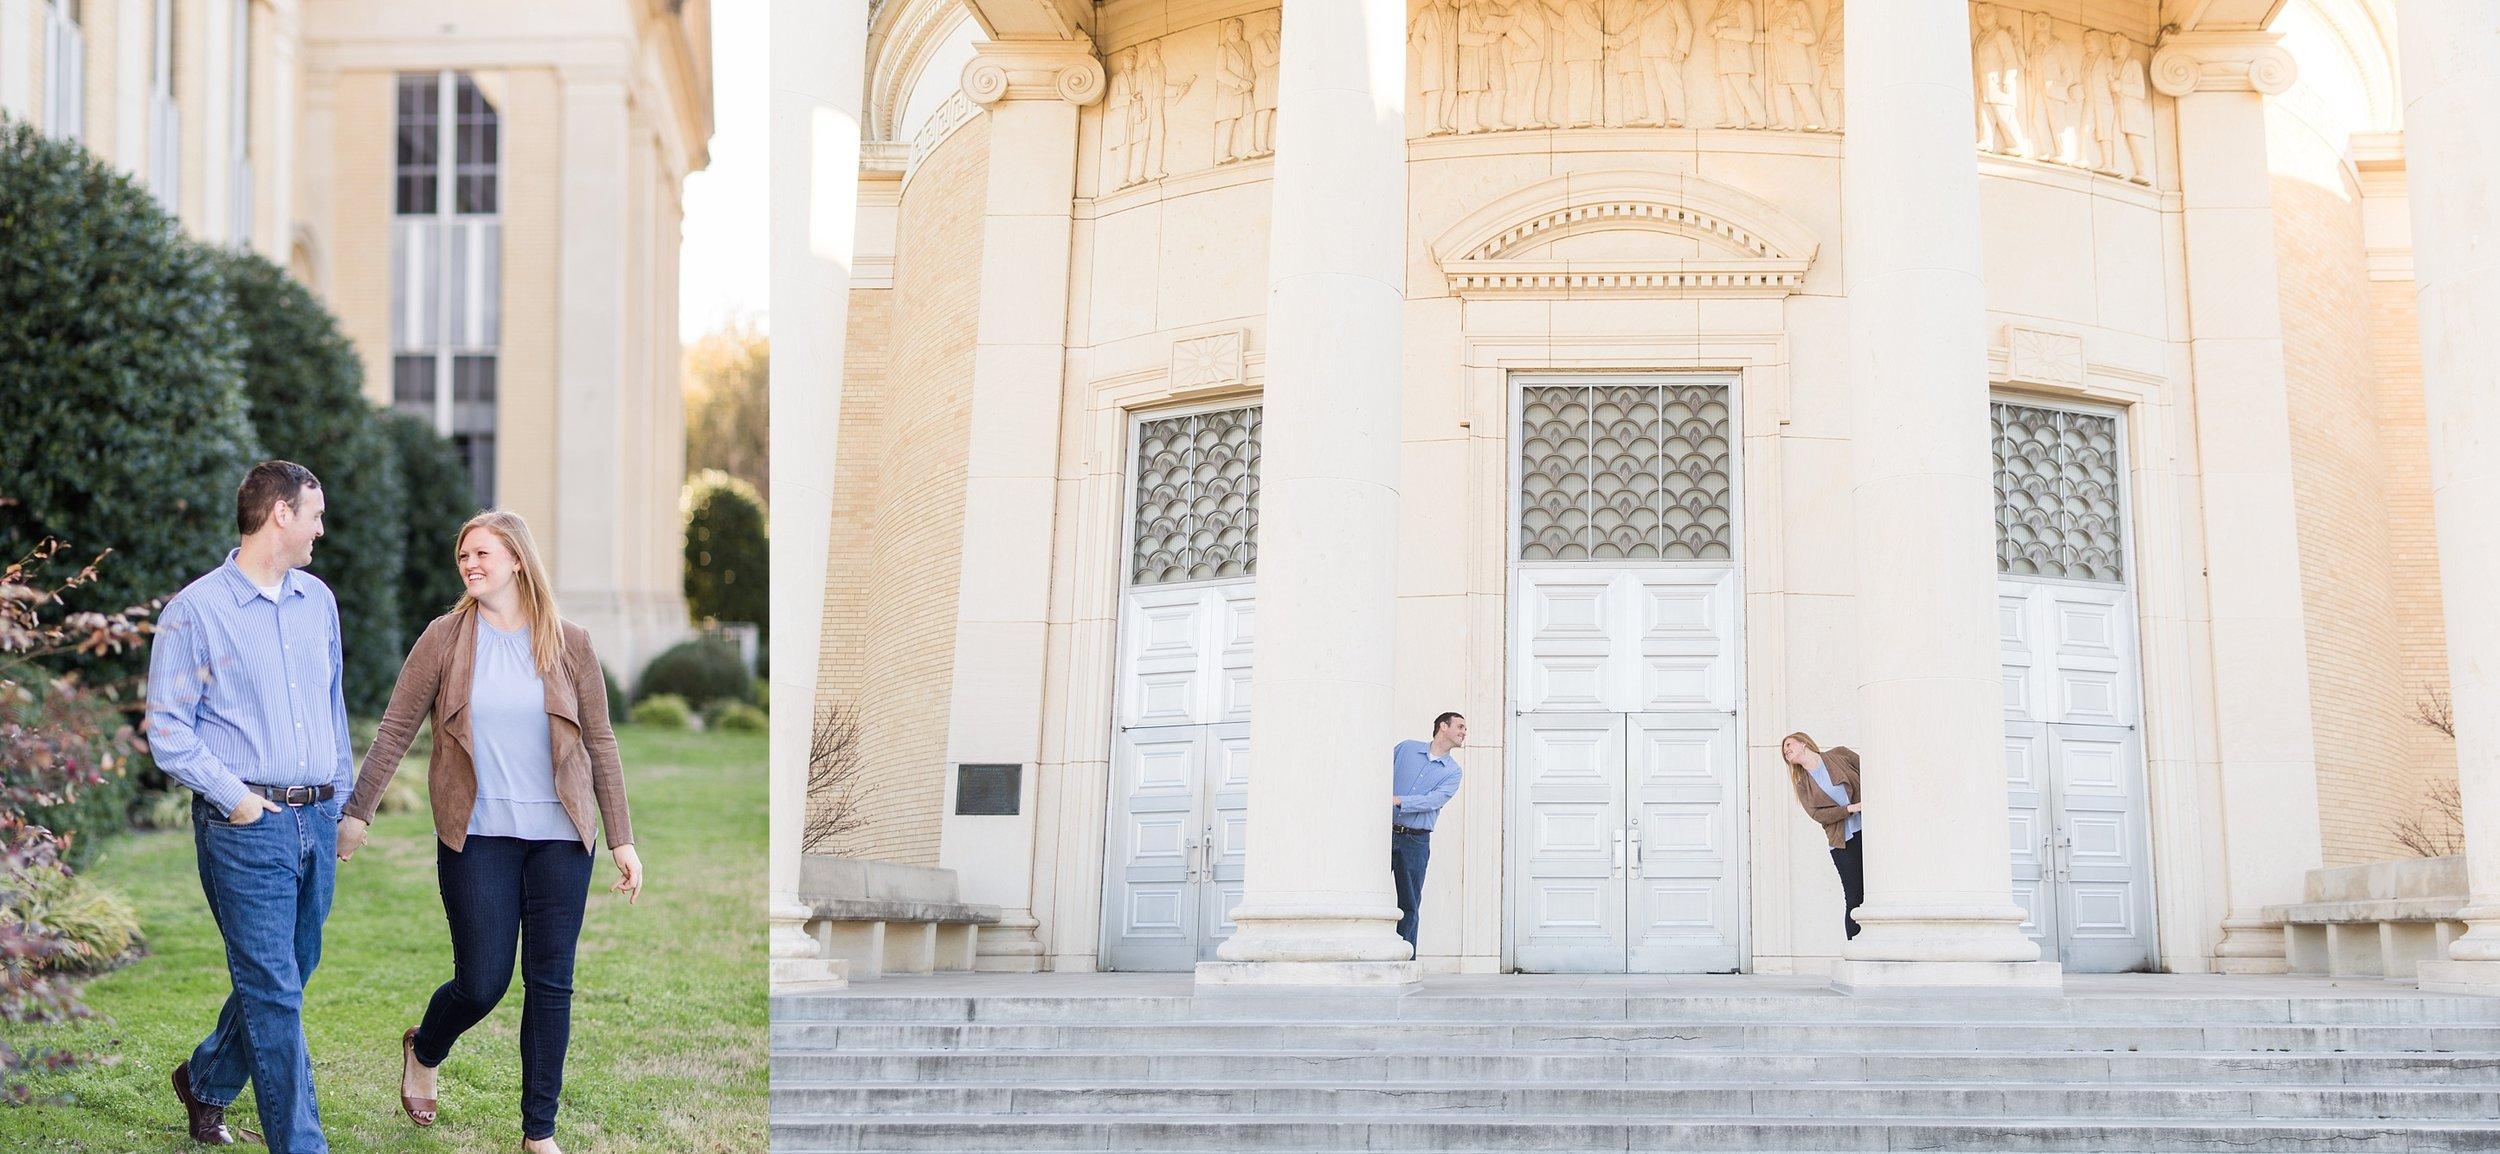 Oklahoma-City-WeddingPhotographers-Dallas-Engagement-Session-JessicaMcBroom